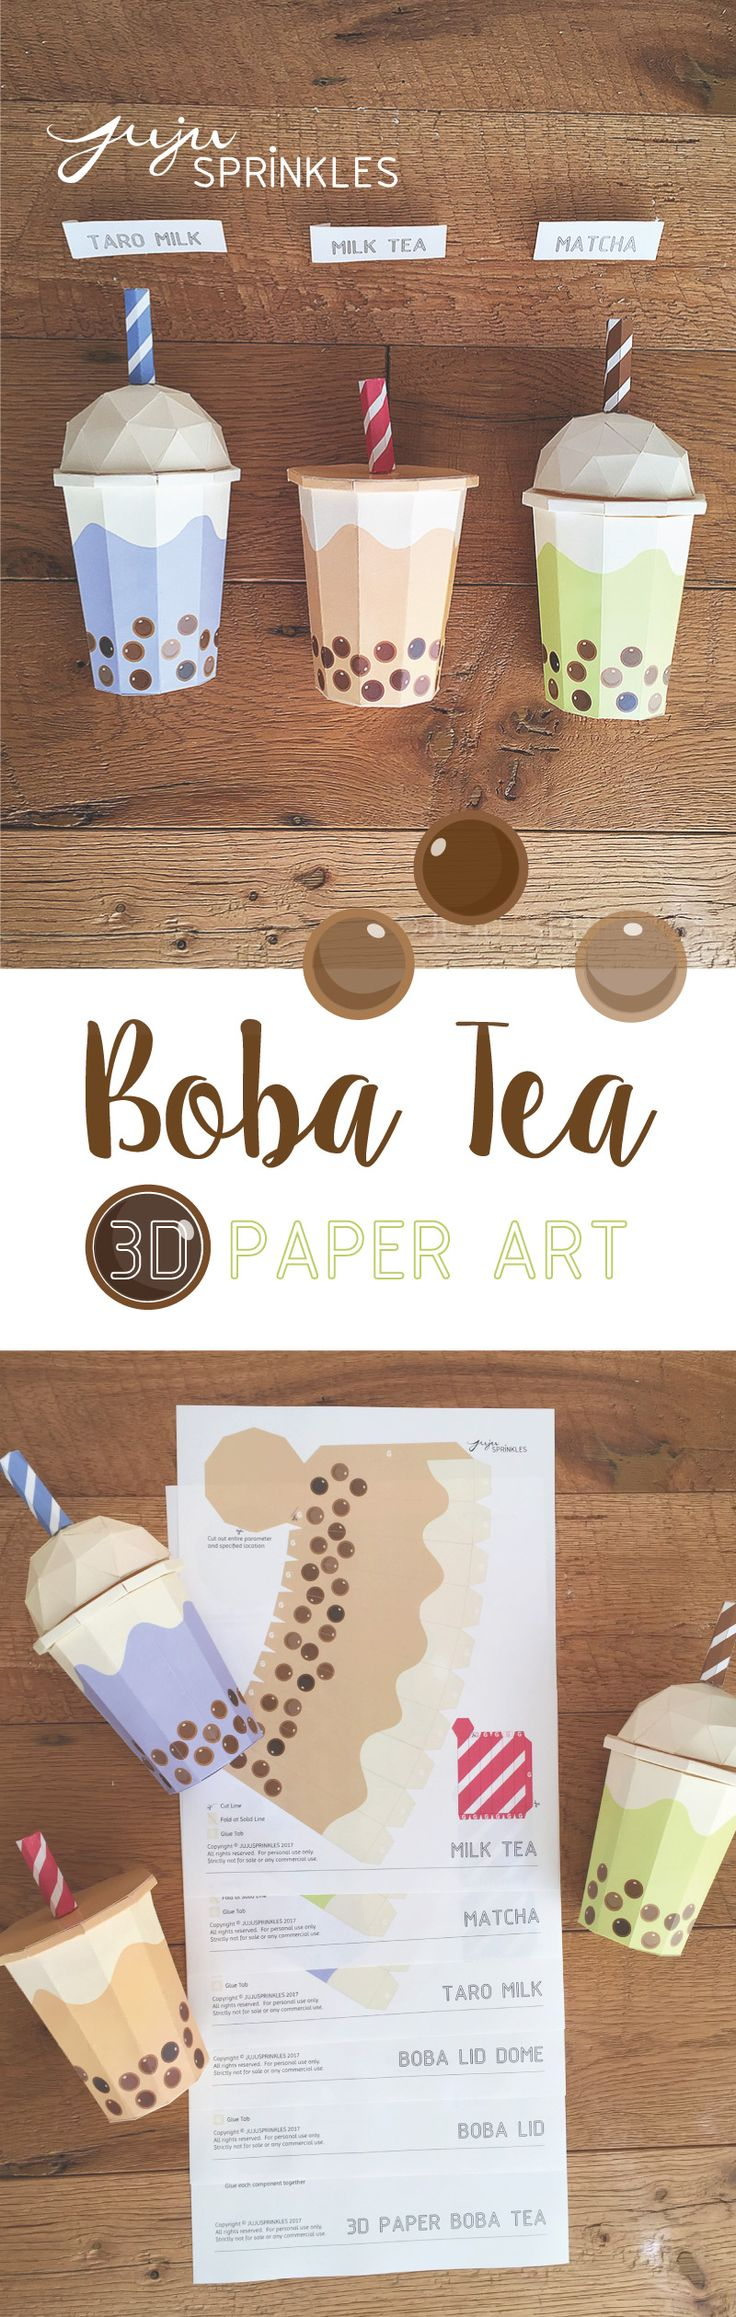 Juju Sprinkles - boba bubble tea 3D paper art